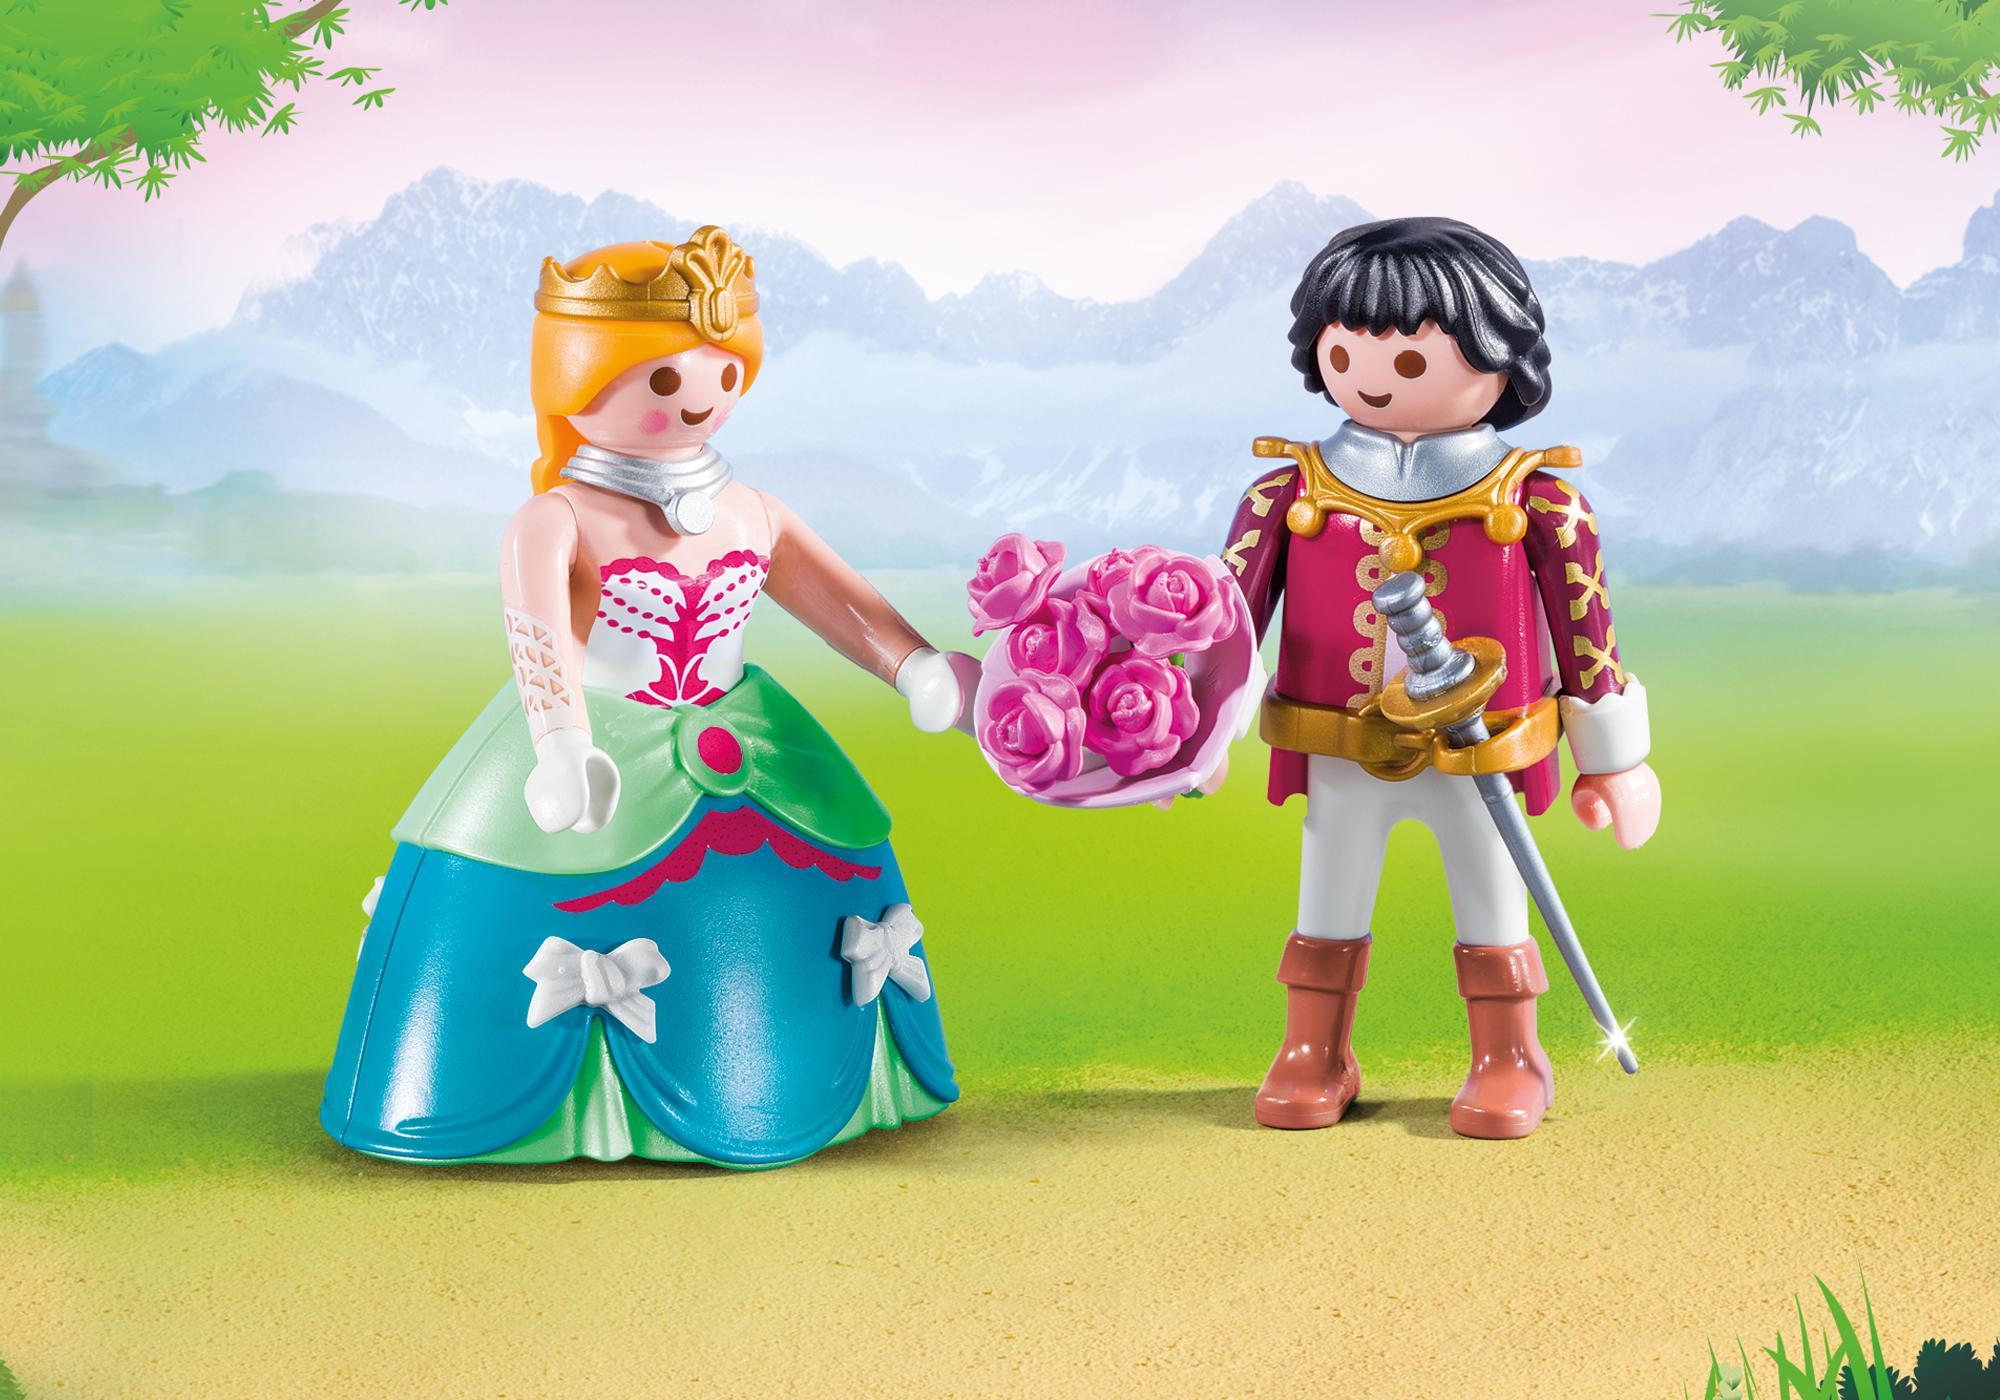 http://media.playmobil.com/i/playmobil/9215_product_detail/Prince and Princess